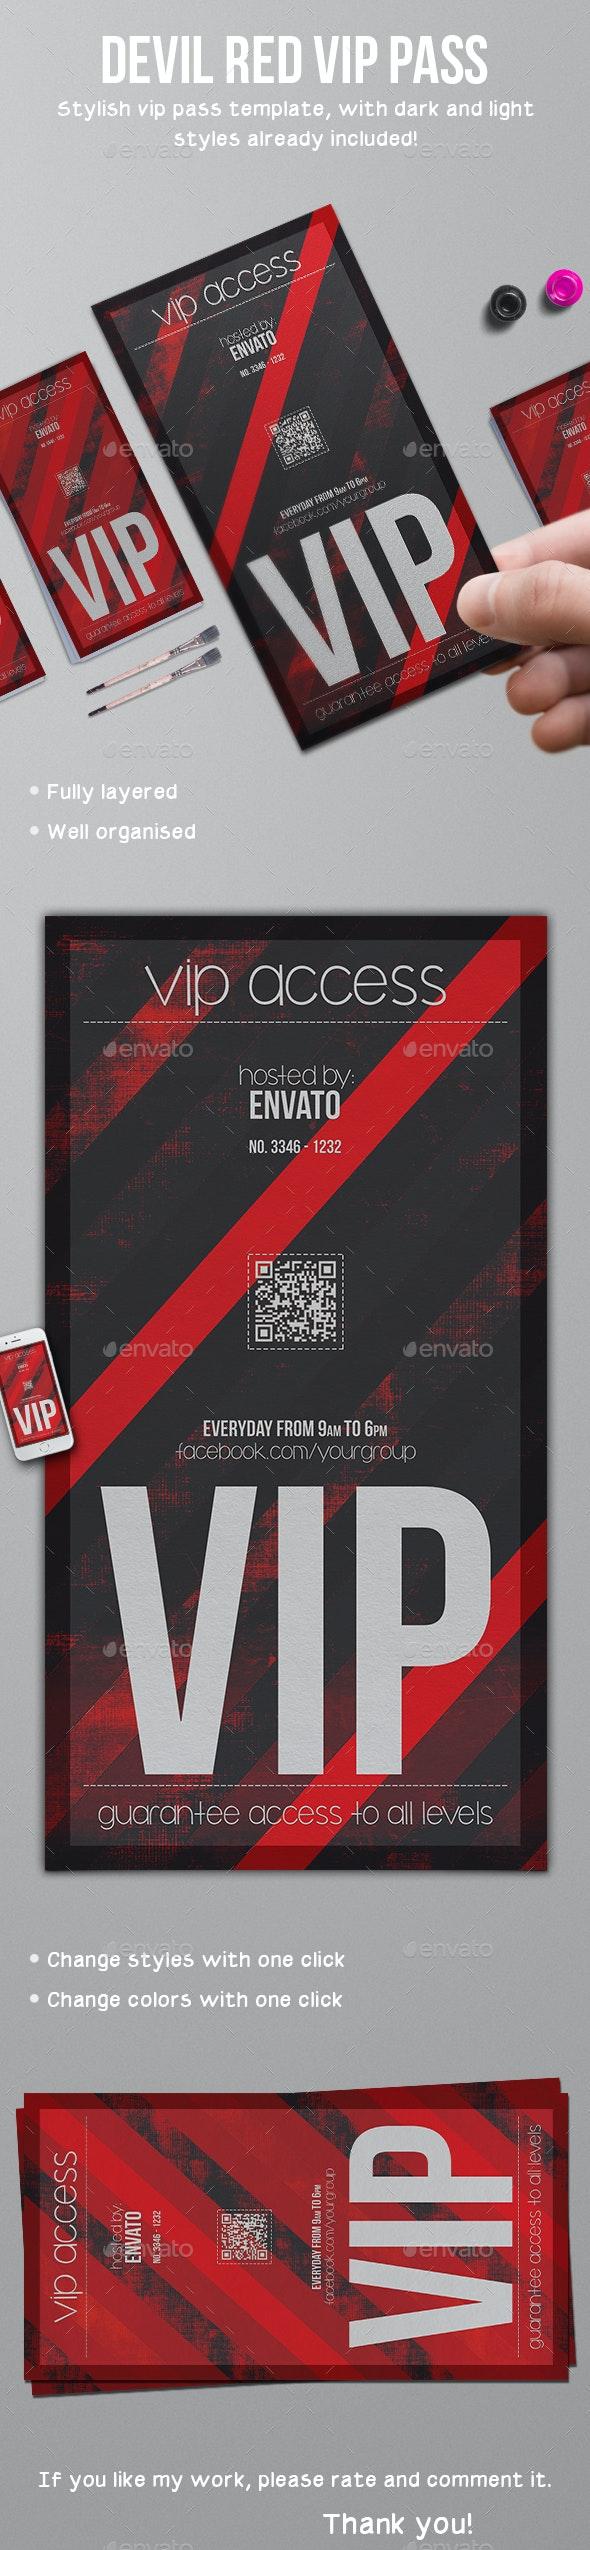 Devil Red Vip Pass Template - Invitations Cards & Invites